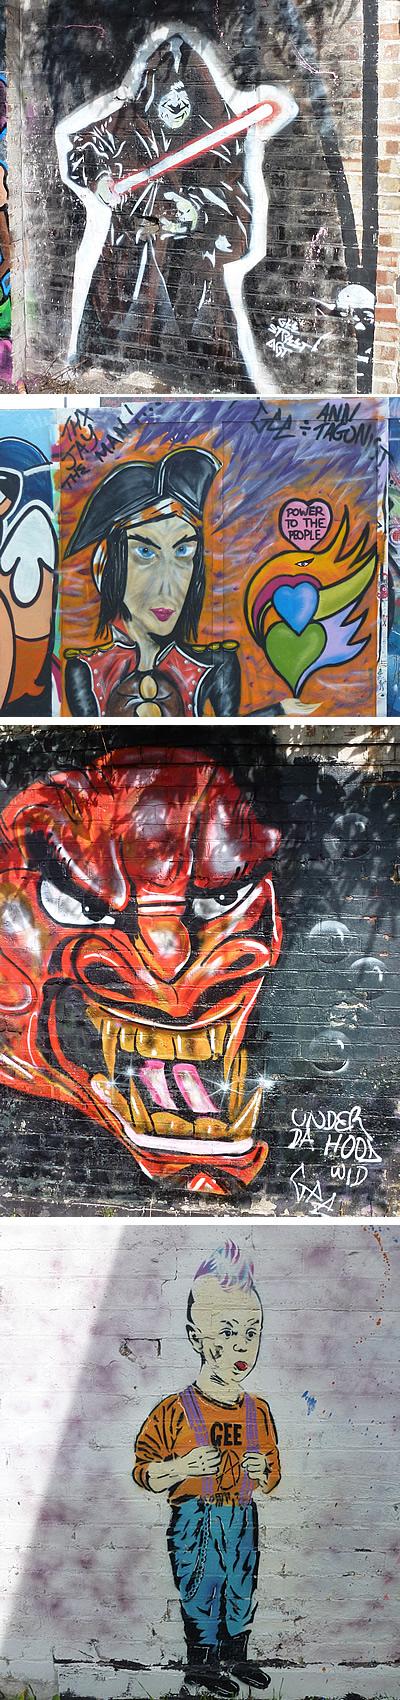 gee-streetart-2013-3.jpg